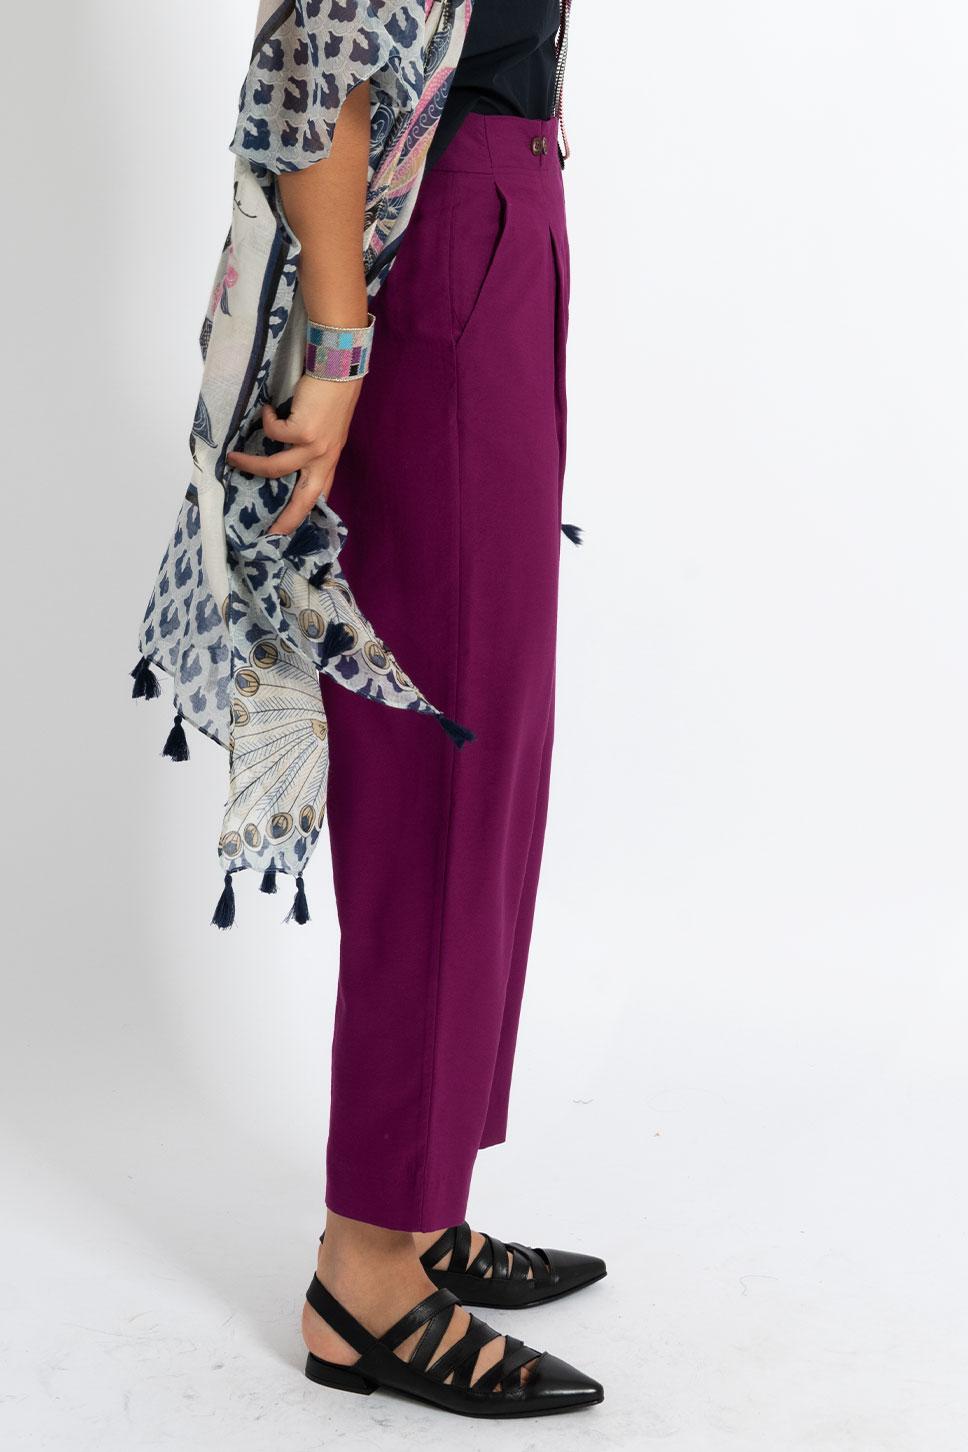 Pantalone ametista con pinces